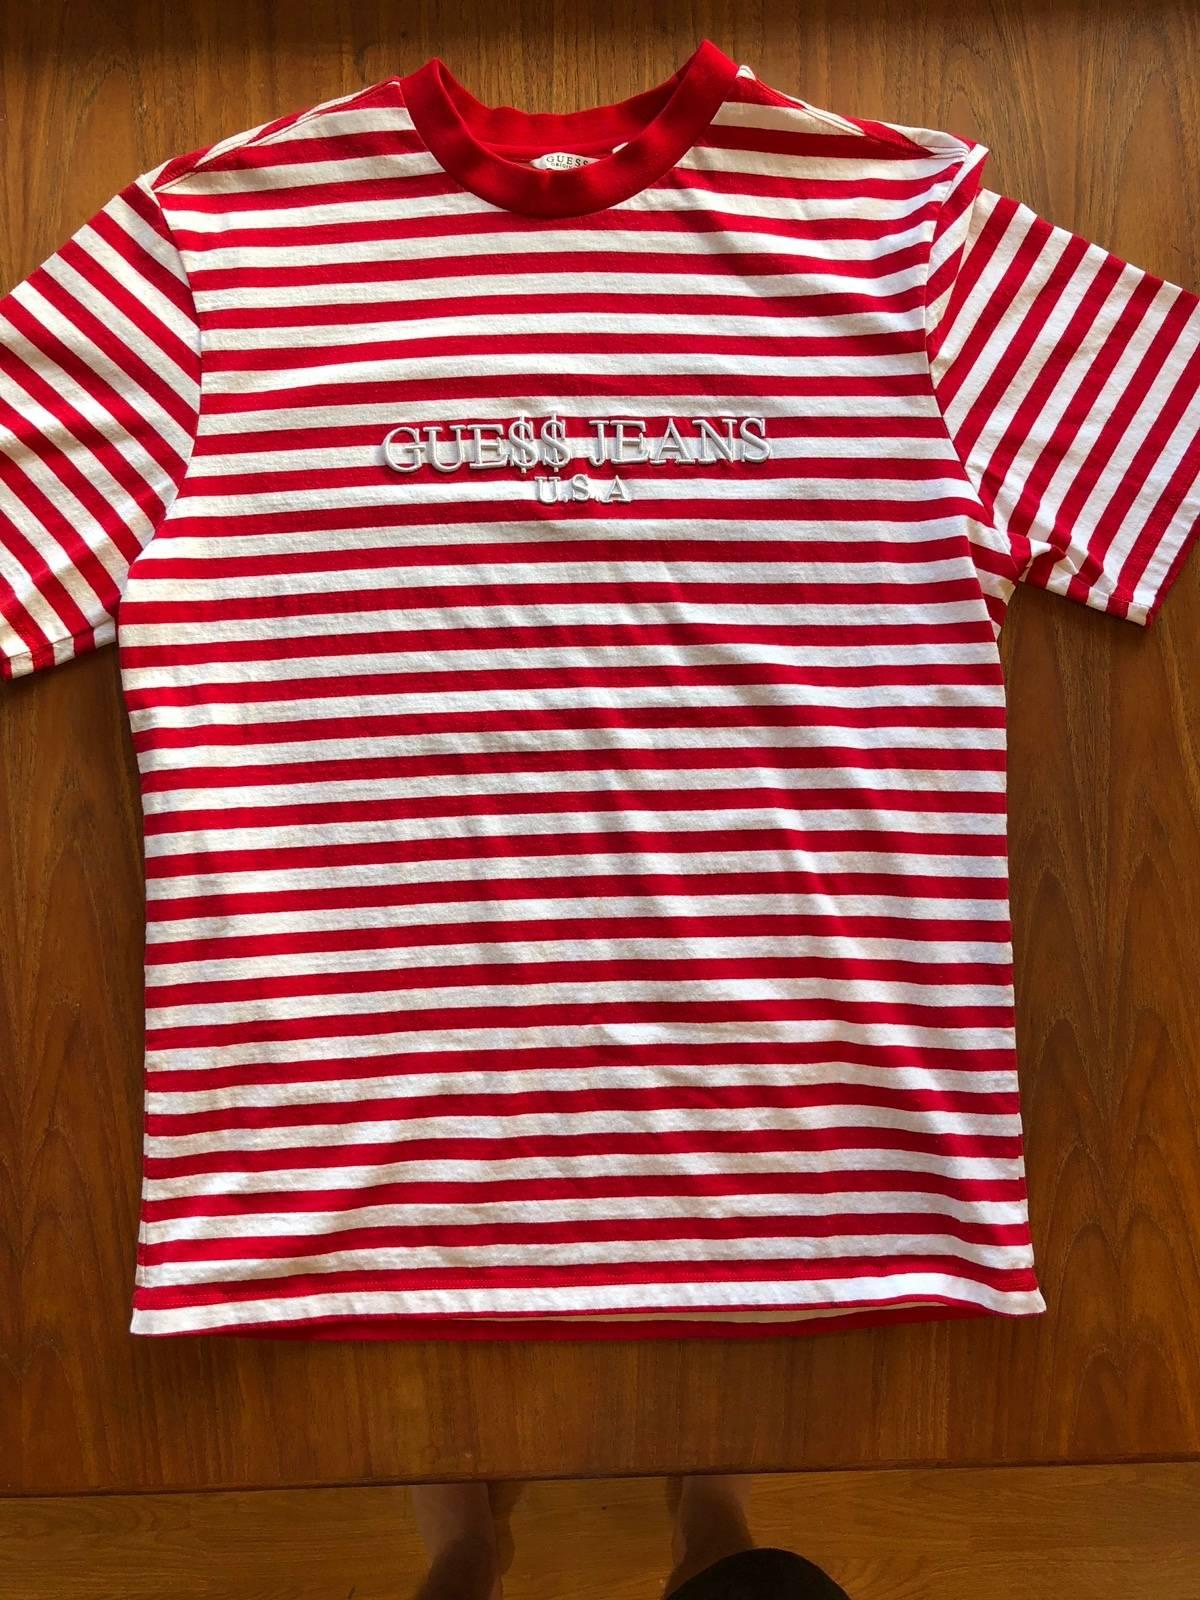 b0bb6d4fc6b7 Guess Jeans Striped Shirt Asap | Saddha